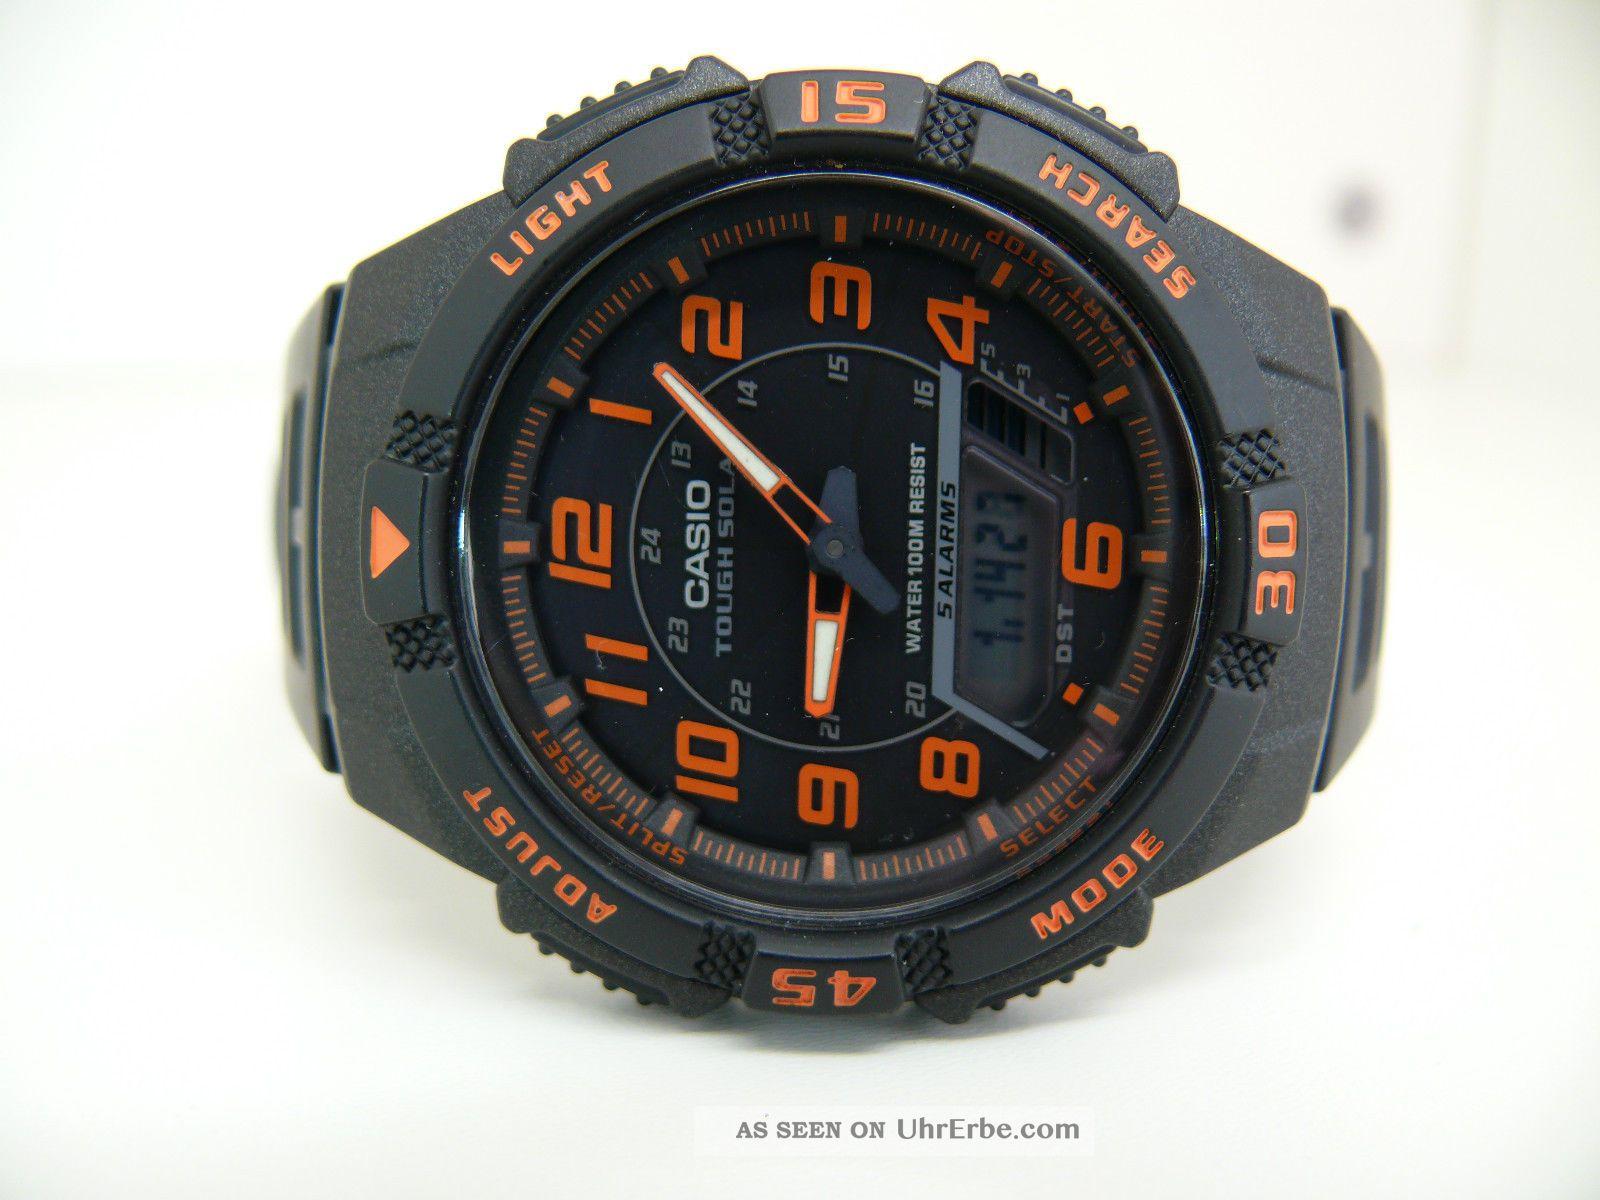 casio tough solar watch manual